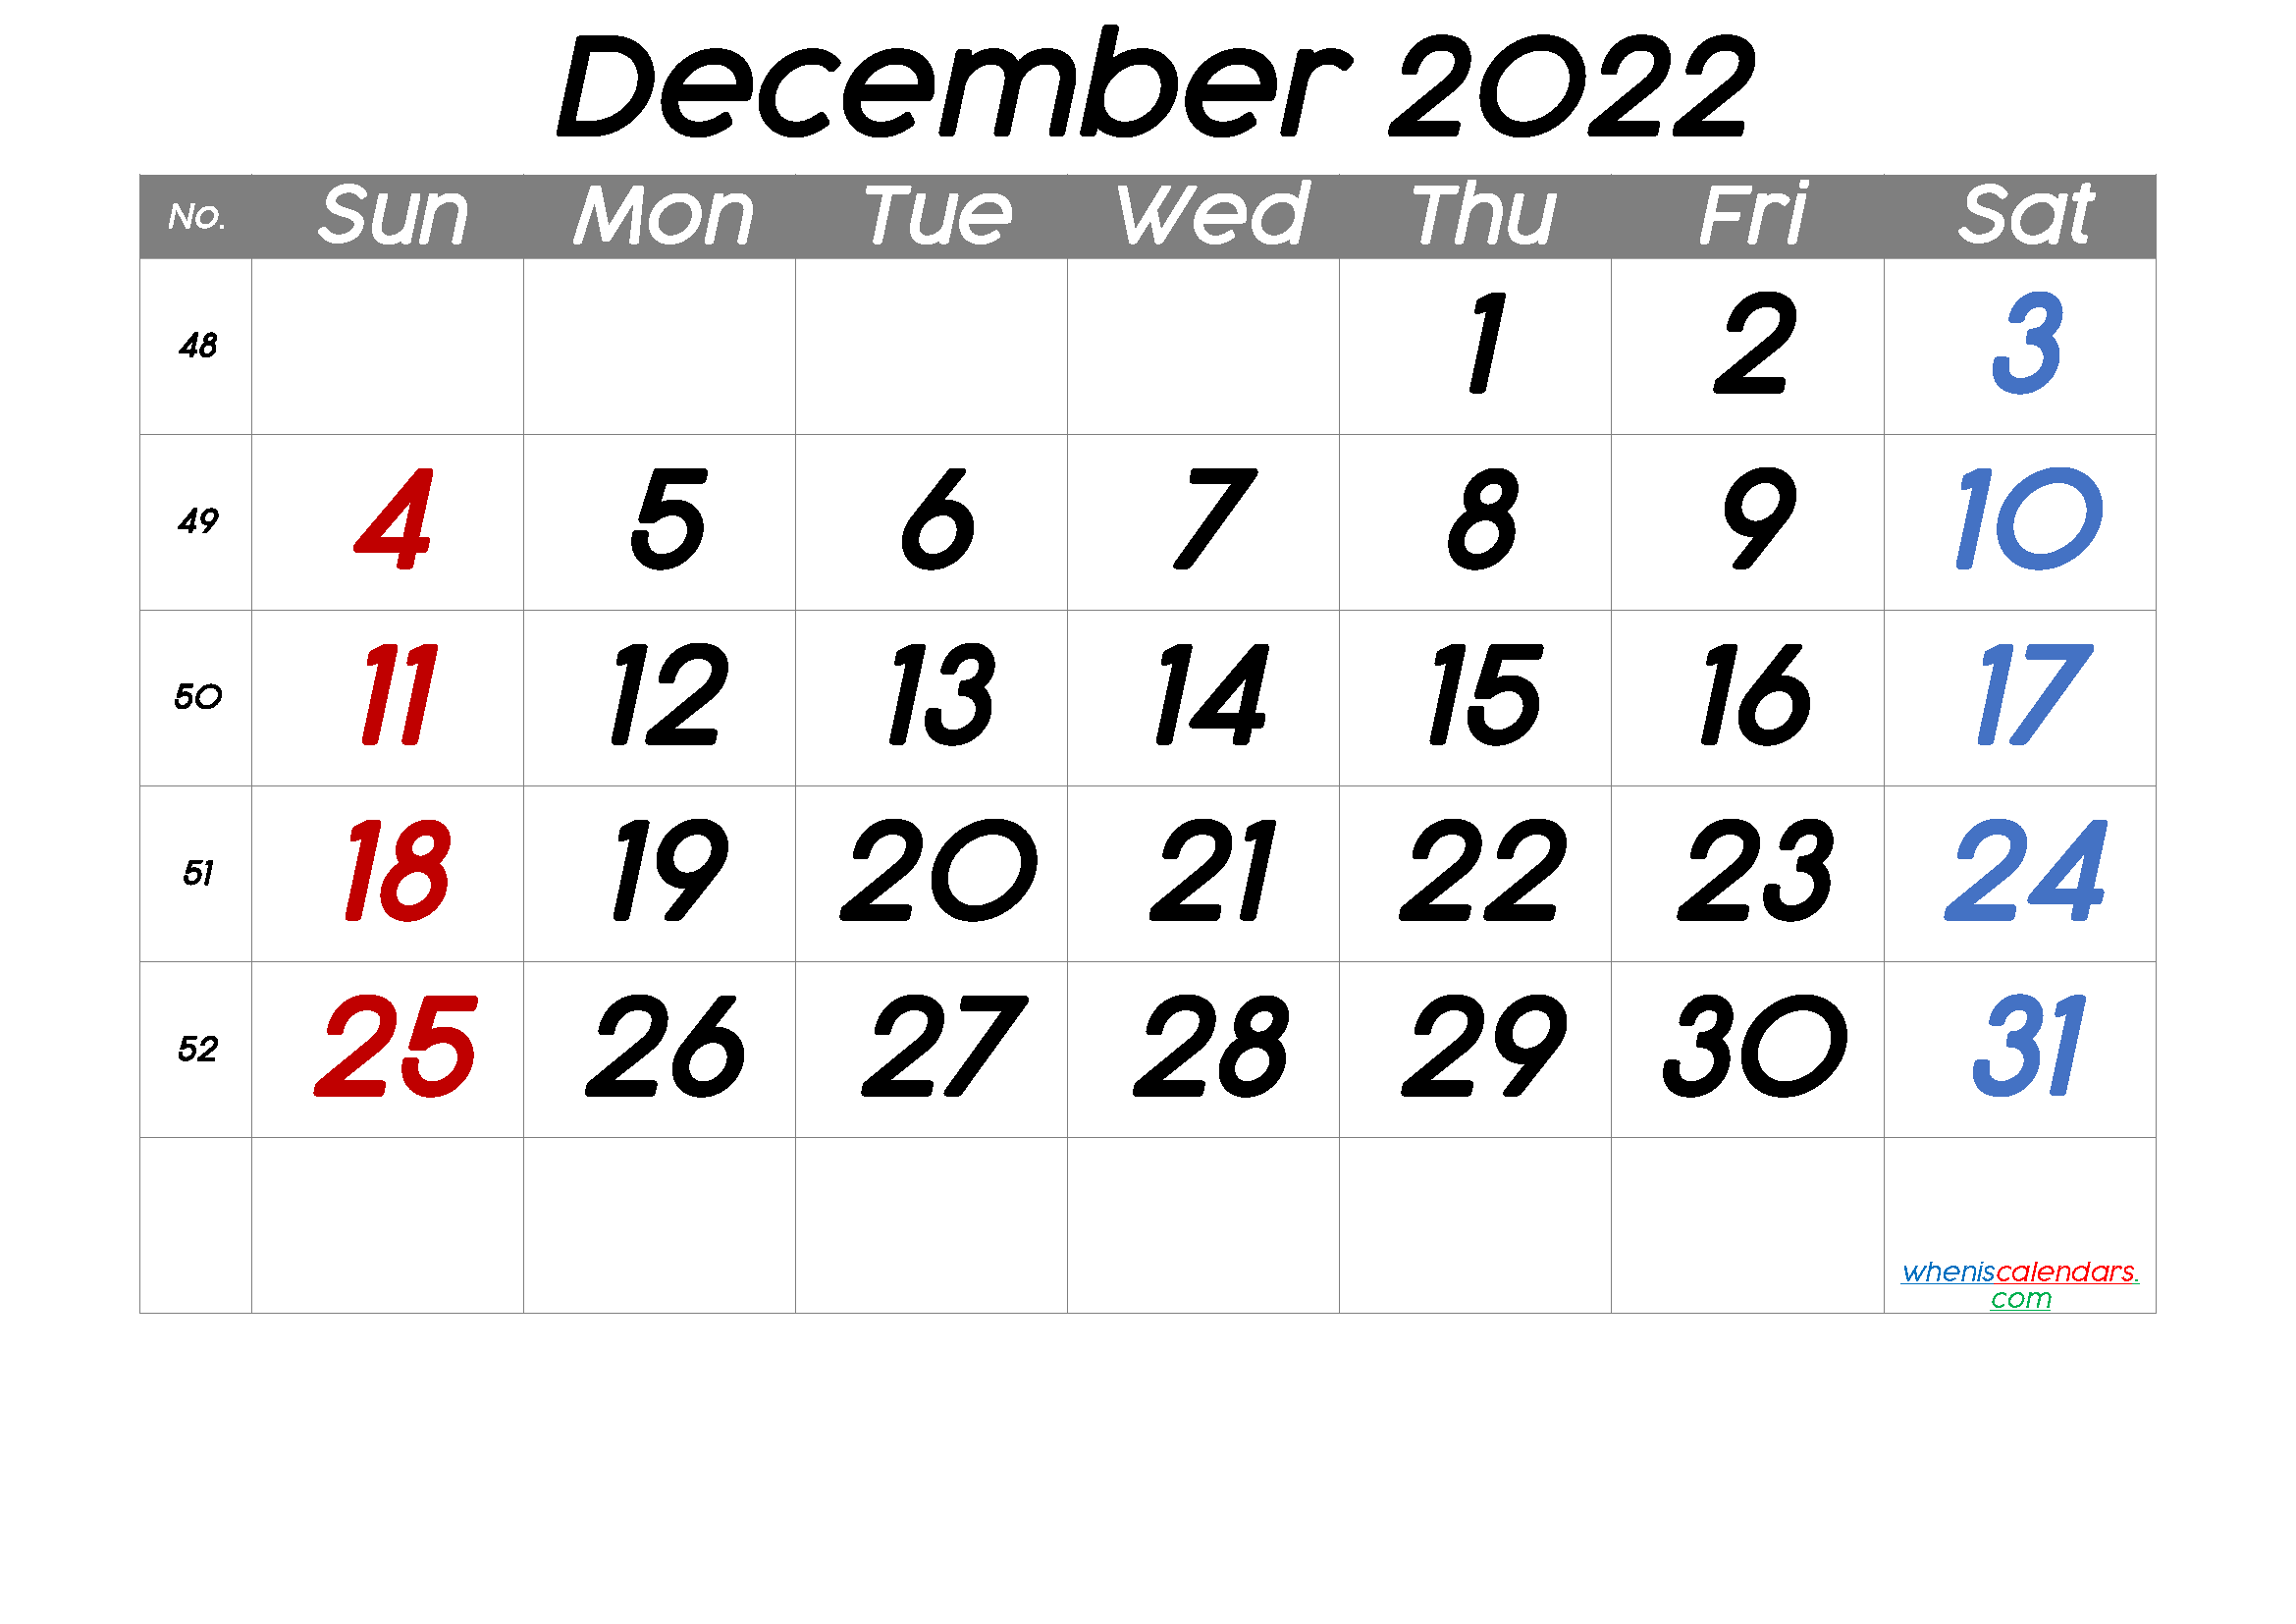 Calendar For December 2022.Printable December 2022 Calendar Free Premium Calendar Printables Calendar Template Printable Calendar Numbers